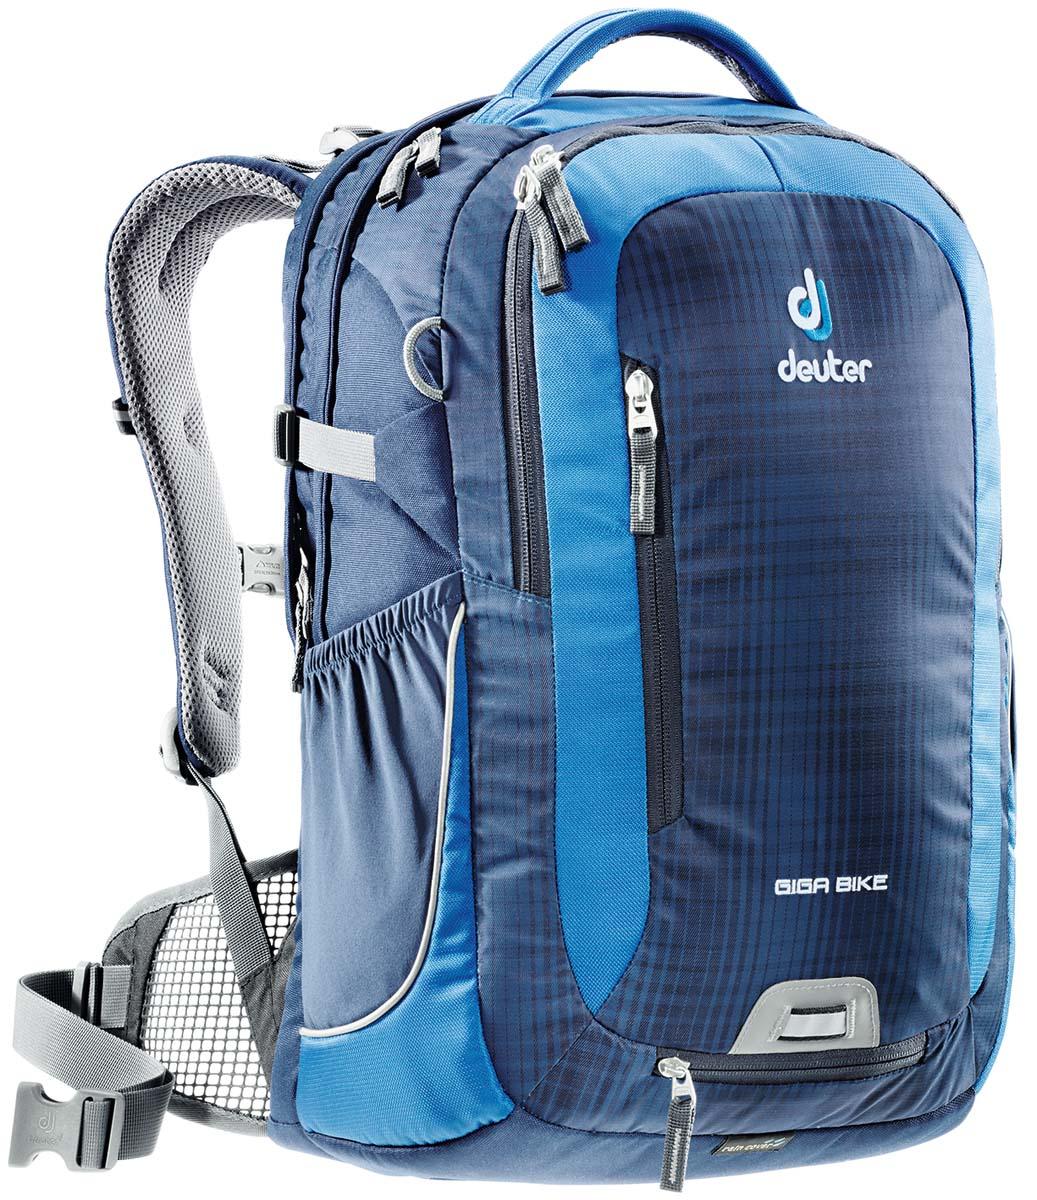 Рюкзак Deuter Giga Bike, цвет: светло-голубой, синий, 28 л рюкзак deuter daypacks giga pro black